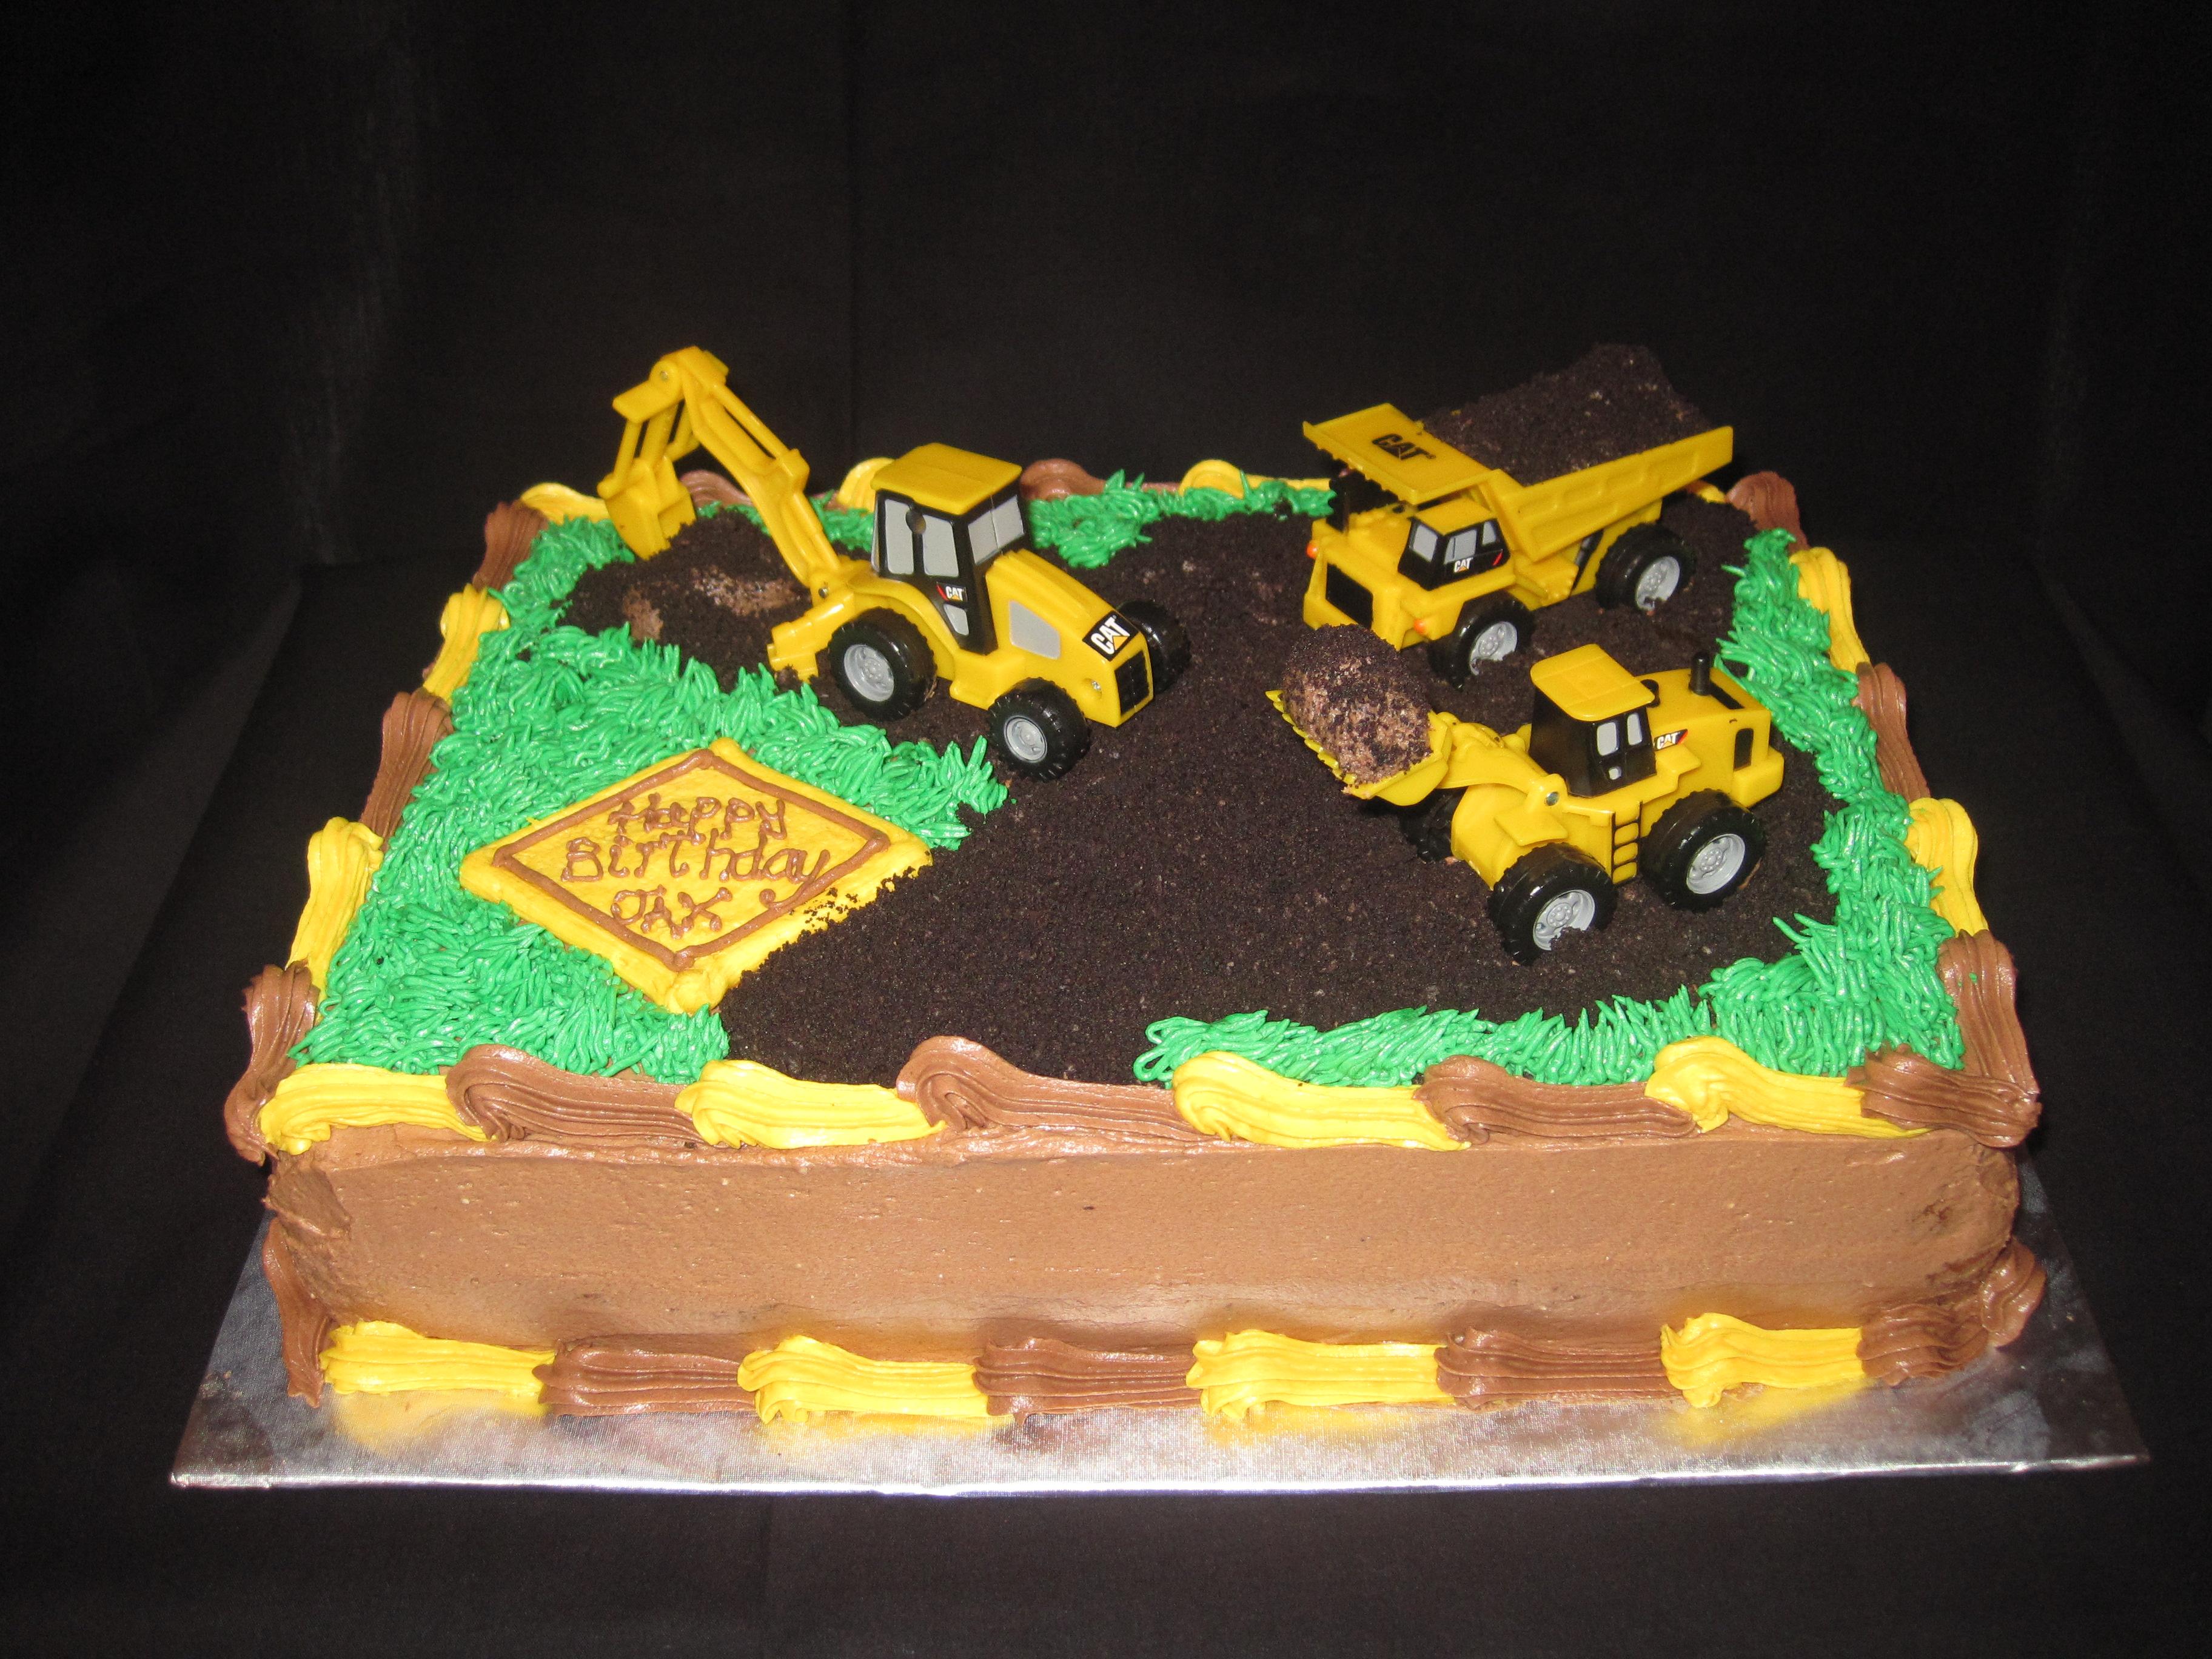 Sensational 12 Boy Birthday Cakes Ideas With Trucks Photo Dump Truck Funny Birthday Cards Online Necthendildamsfinfo